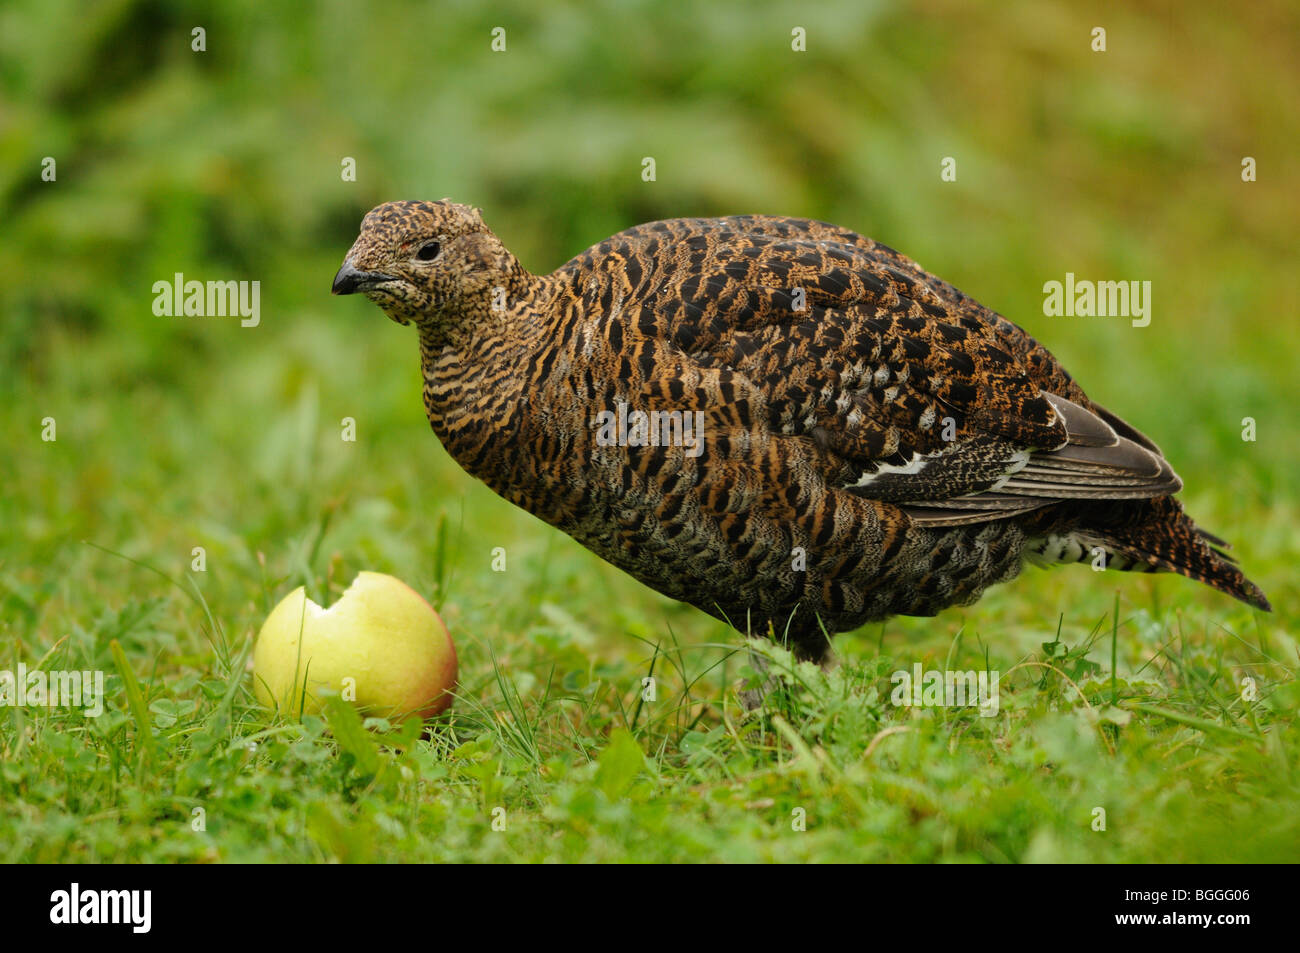 Black grouse, Lyrurus tetrix, Tetrao tetrix - Stock Image